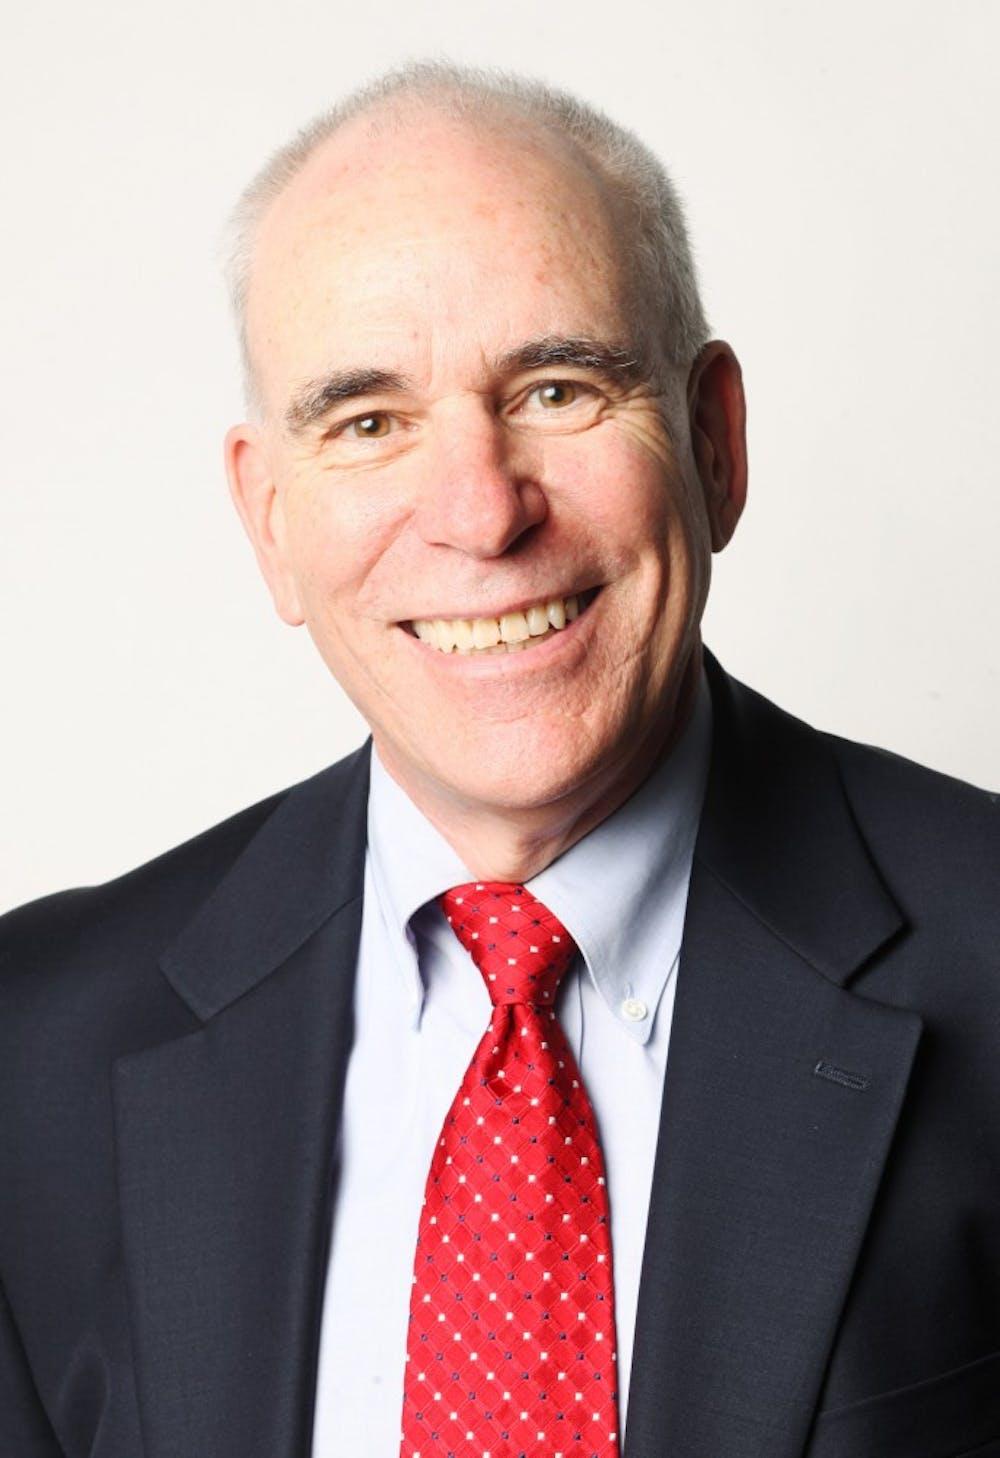 Seasoned professor Paul O'Connor retires after 42 years in journalism